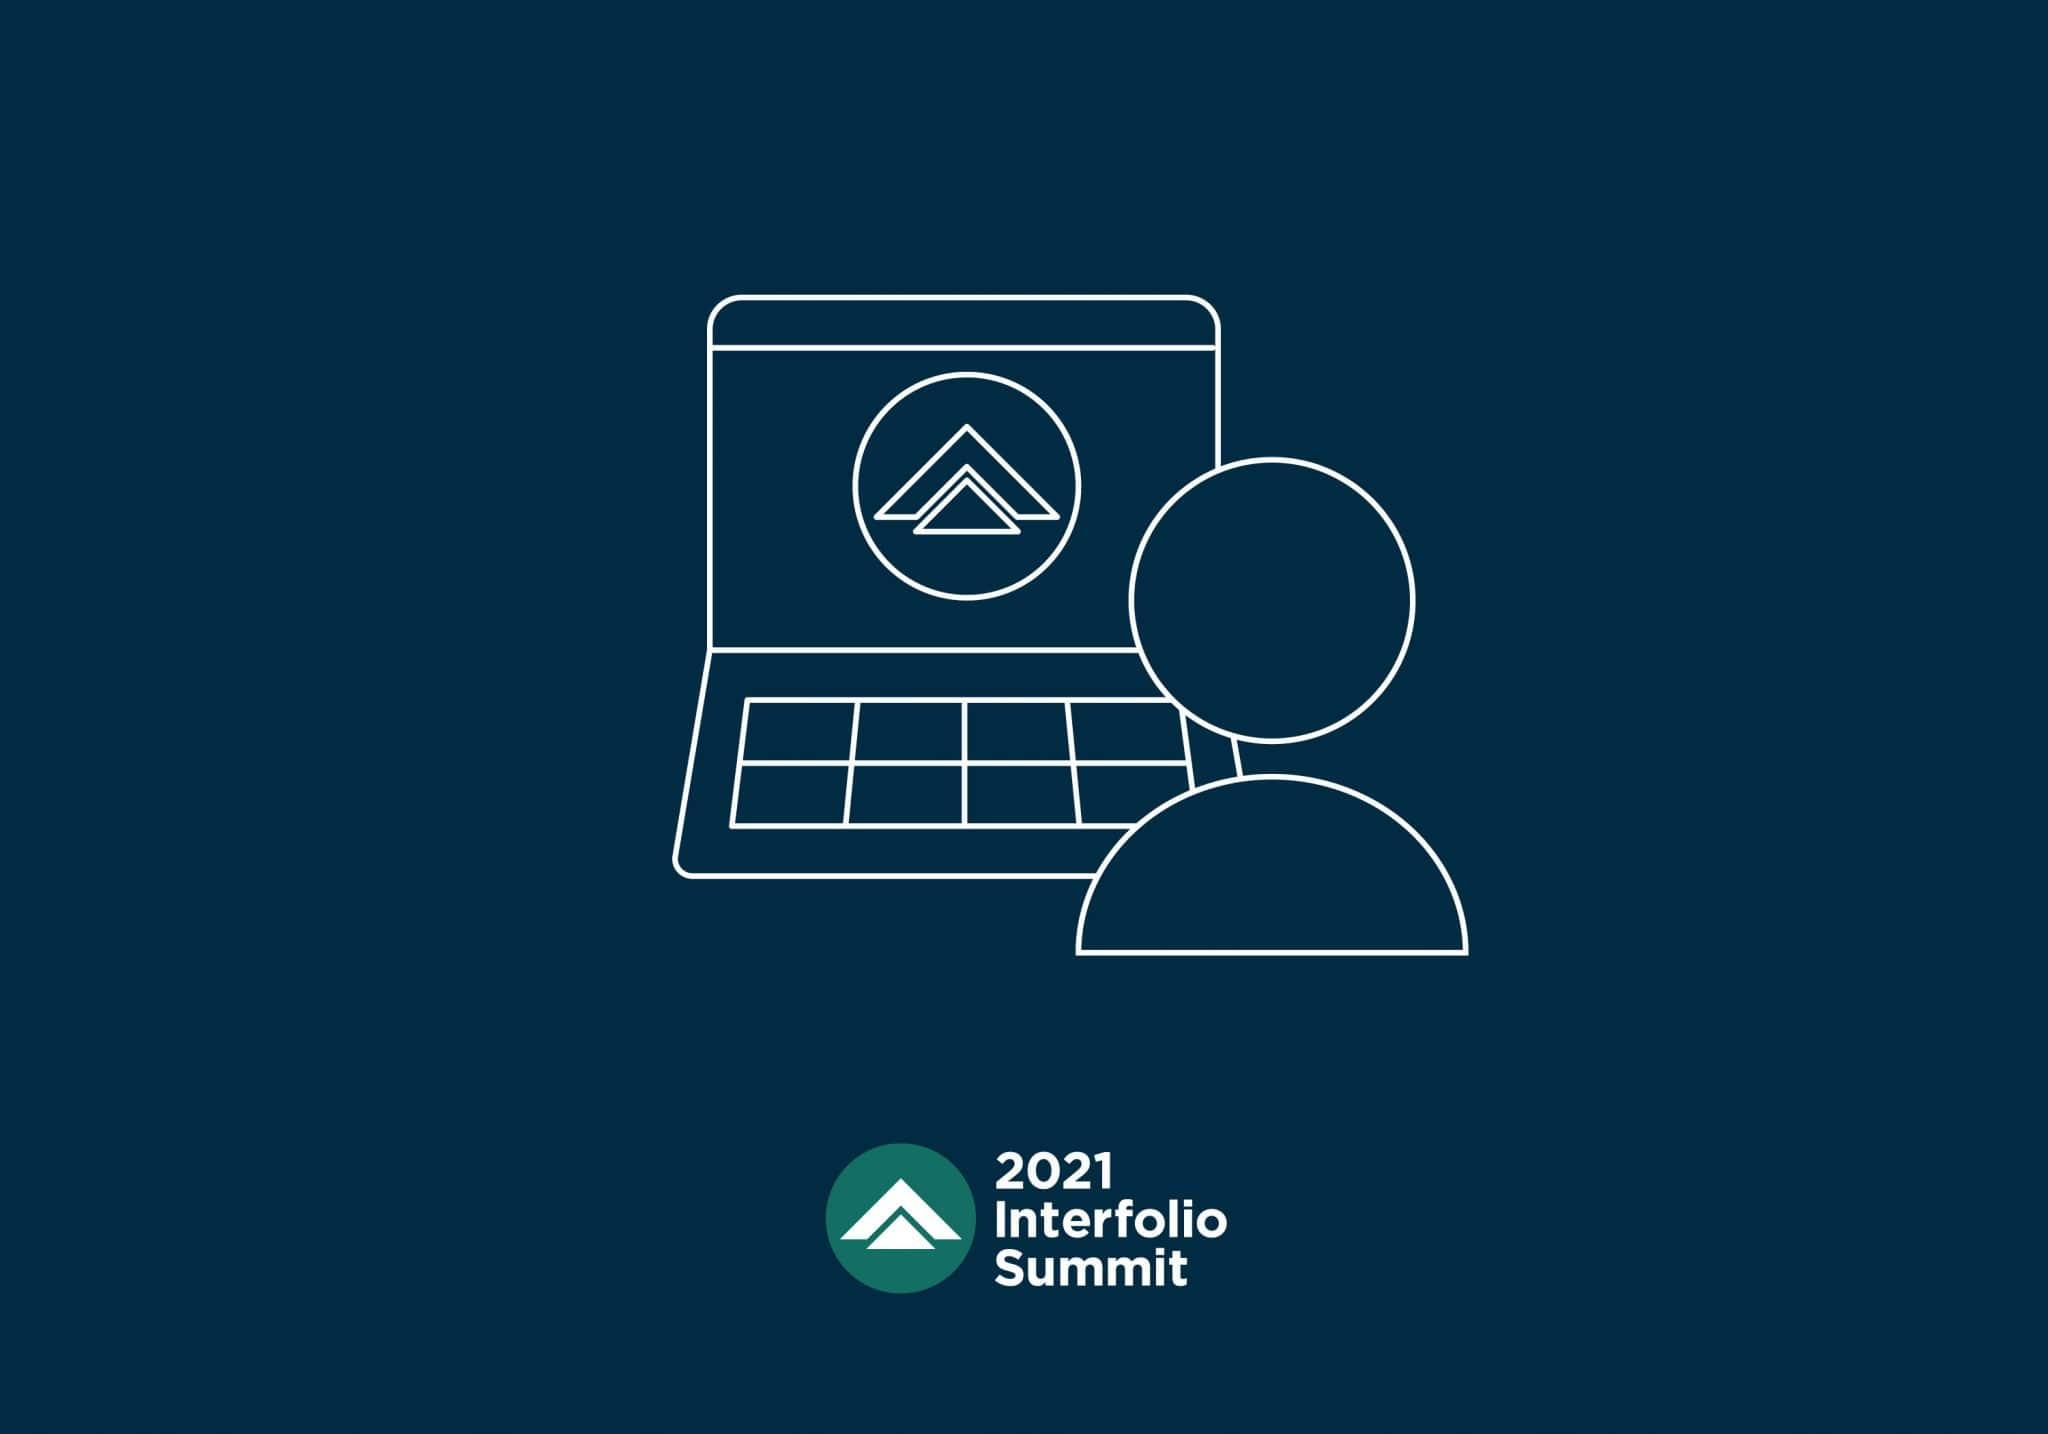 700+ higher education leaders to convene at Interfolio Virtual Summit